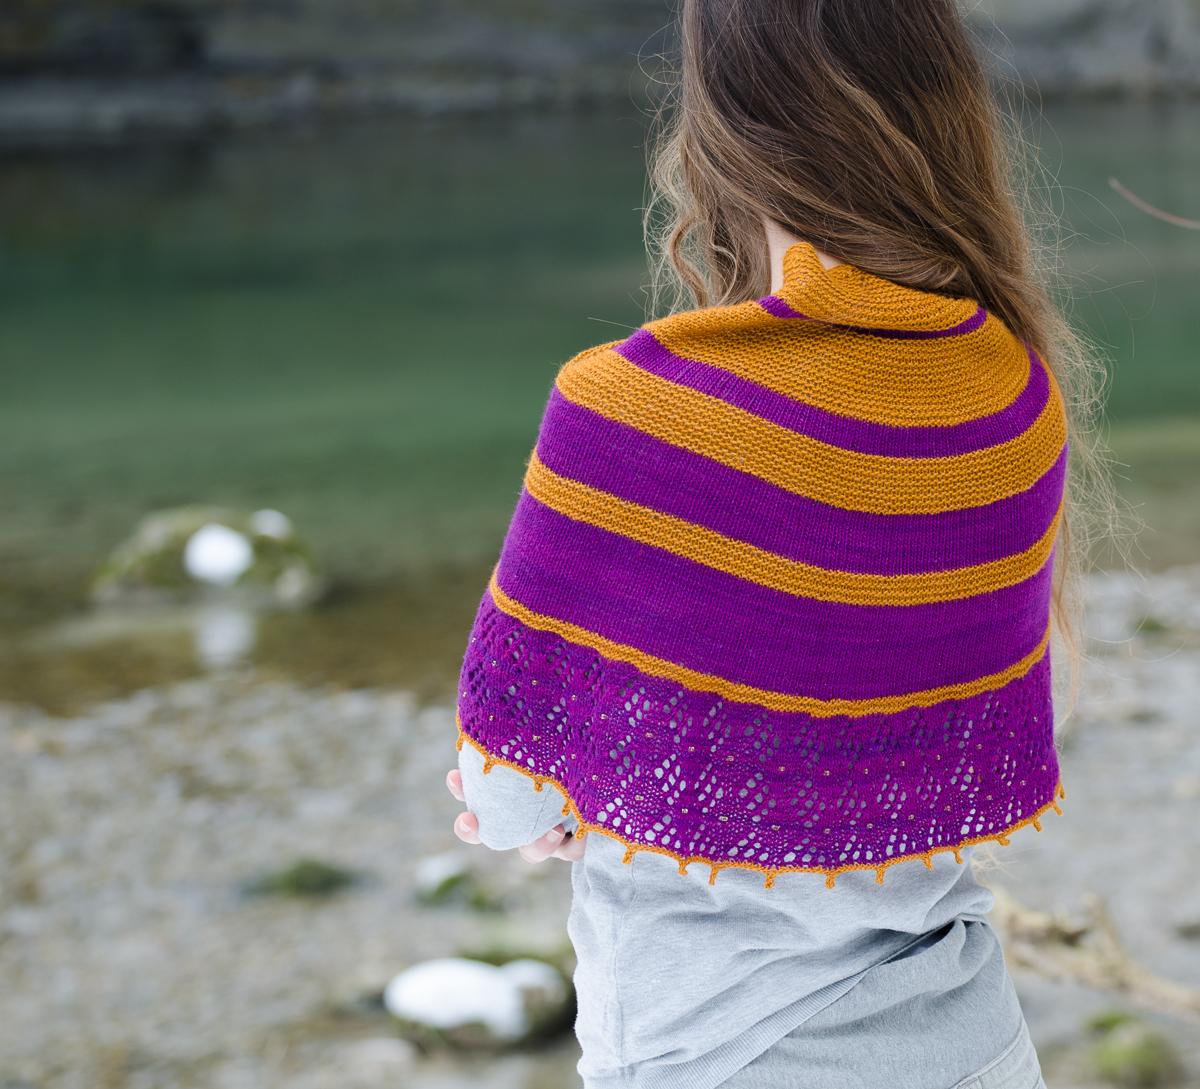 Autumn knitting patterns - Purple Caramel Shawl